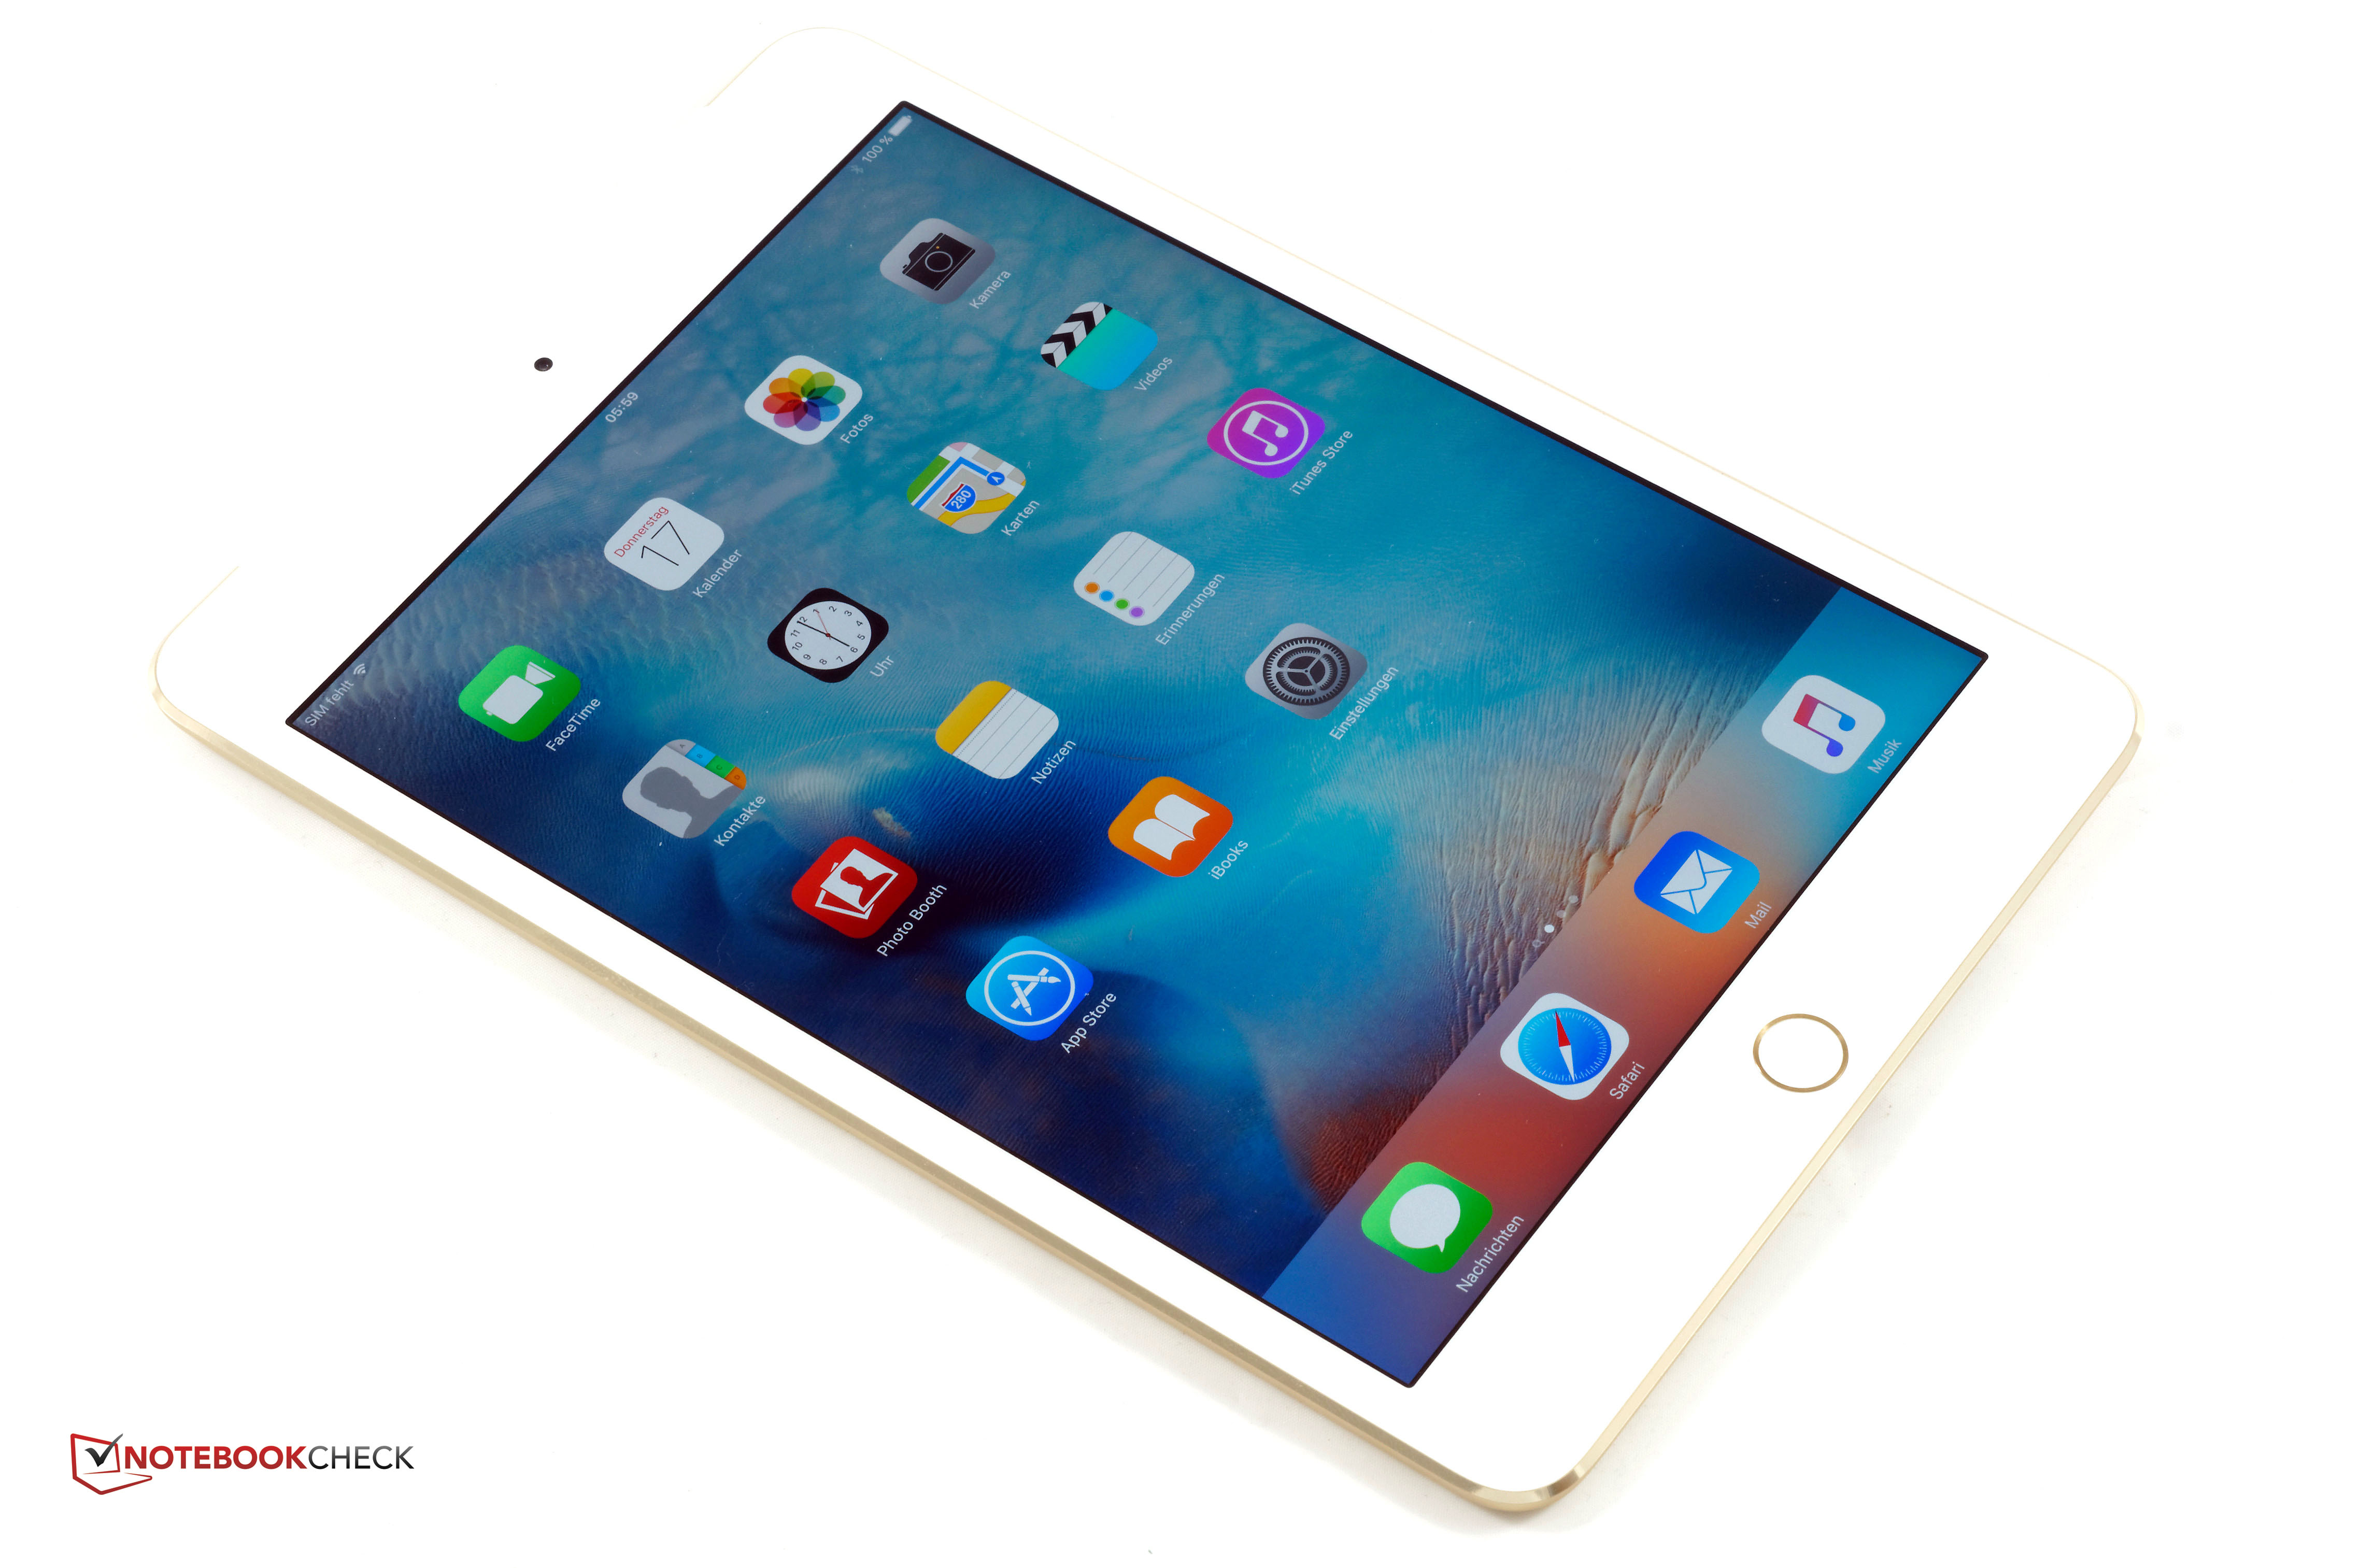 Test Apple iPad Mini 4 Tablet - Notebookcheck.com Tests